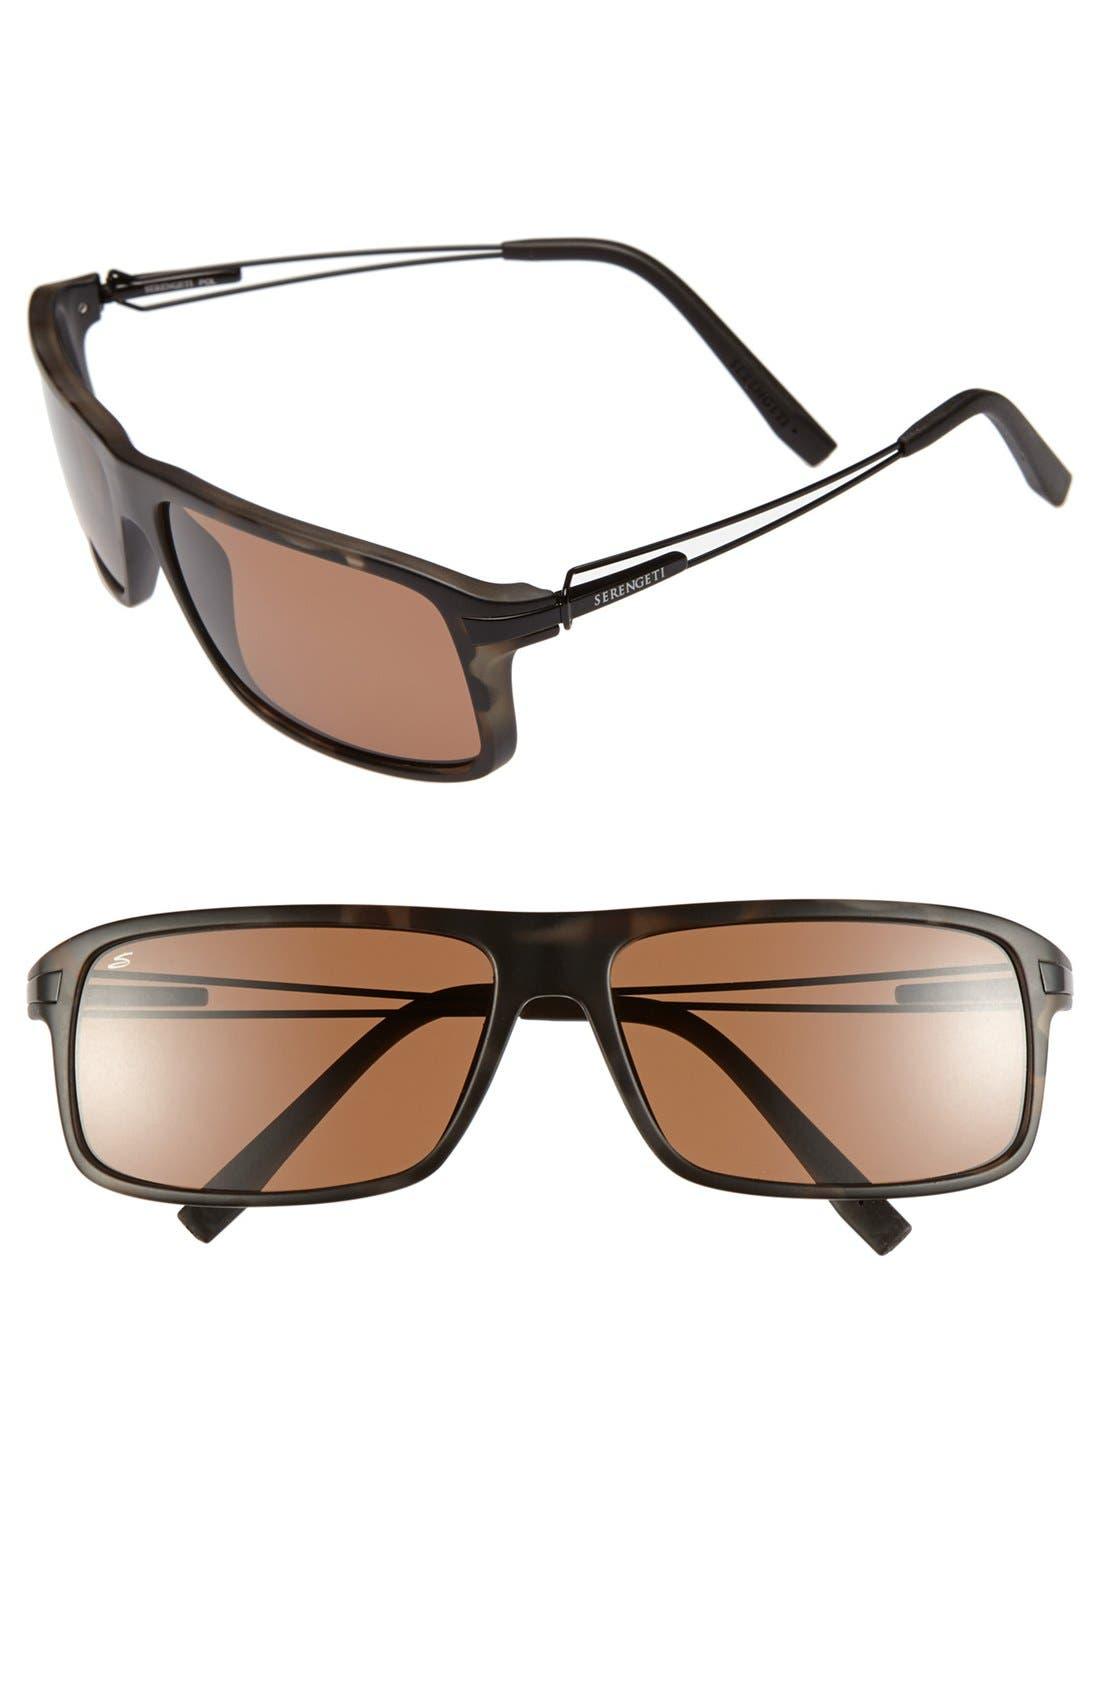 Main Image - Serengeti 'Rivoli' 65mm Polarized Sunglasses